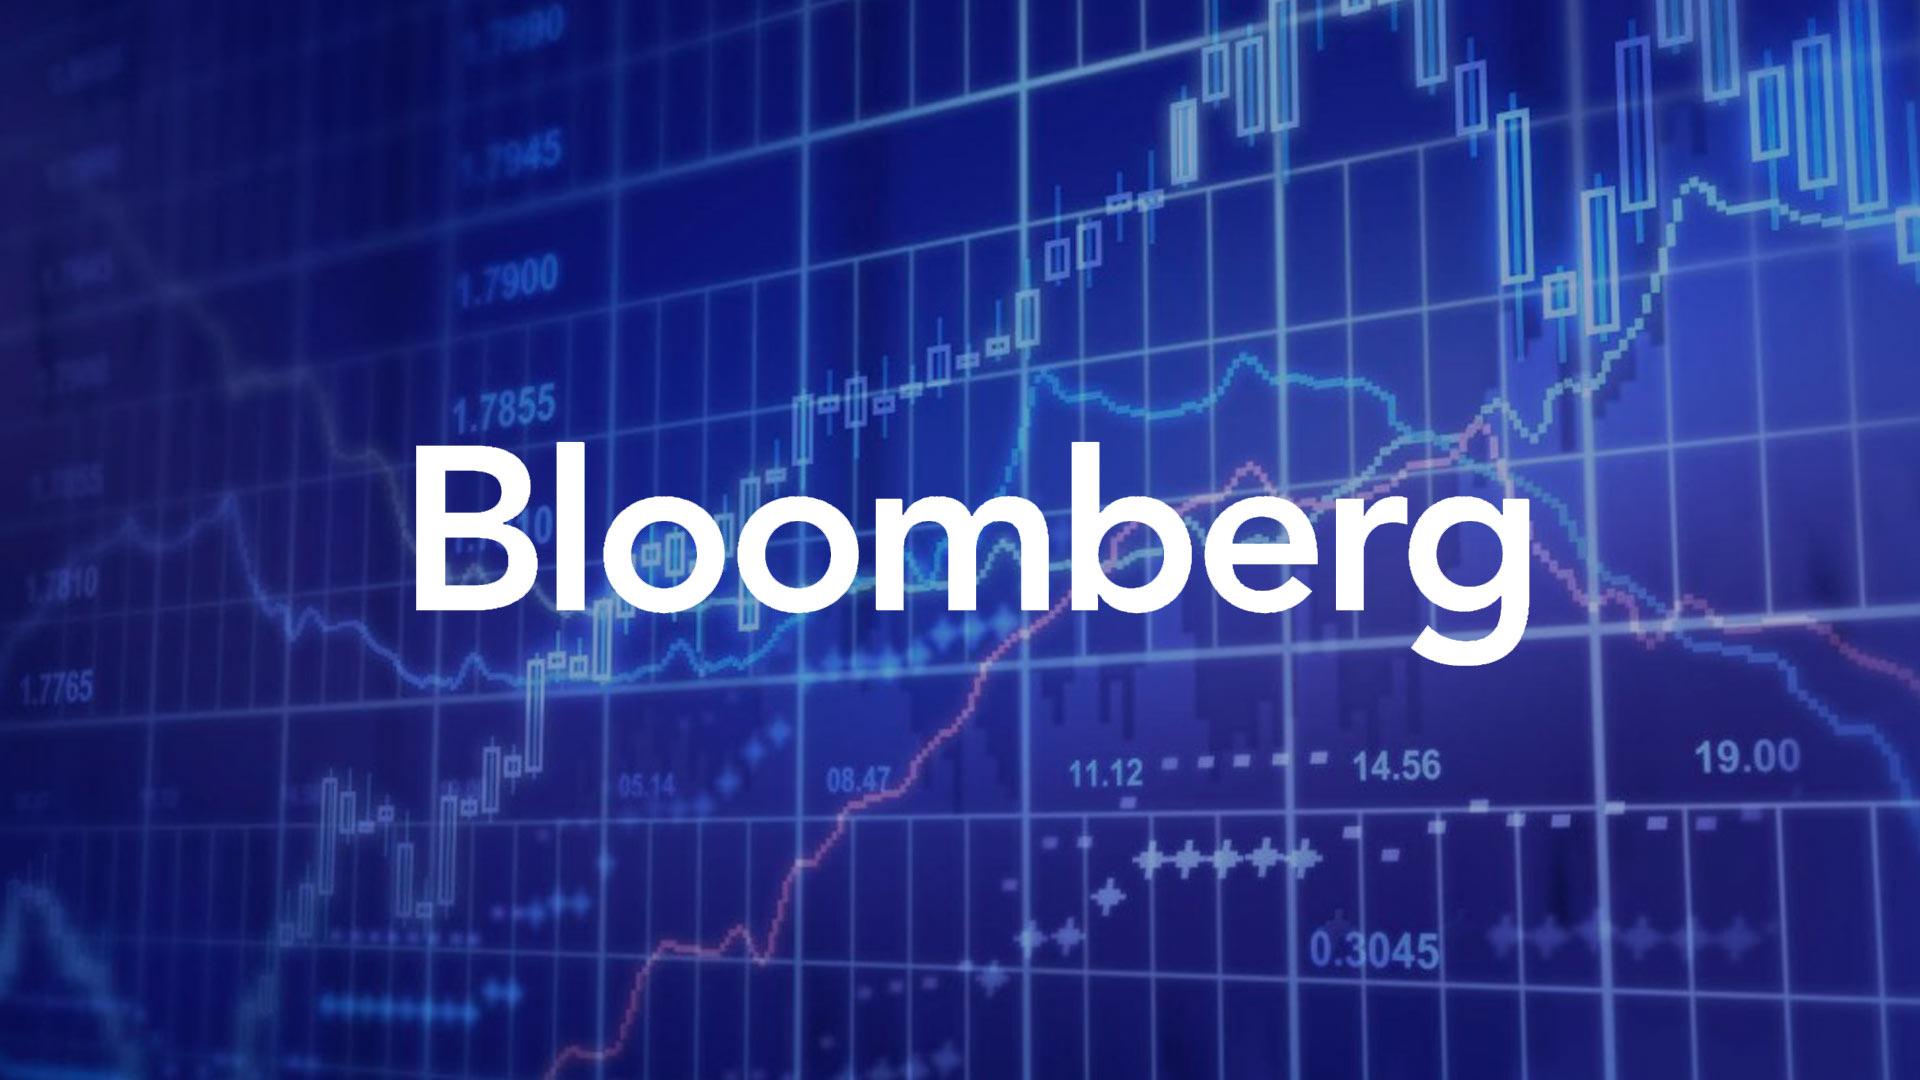 Bloomberg: аналитики предупредили о нефти по 5 долларов за баррель